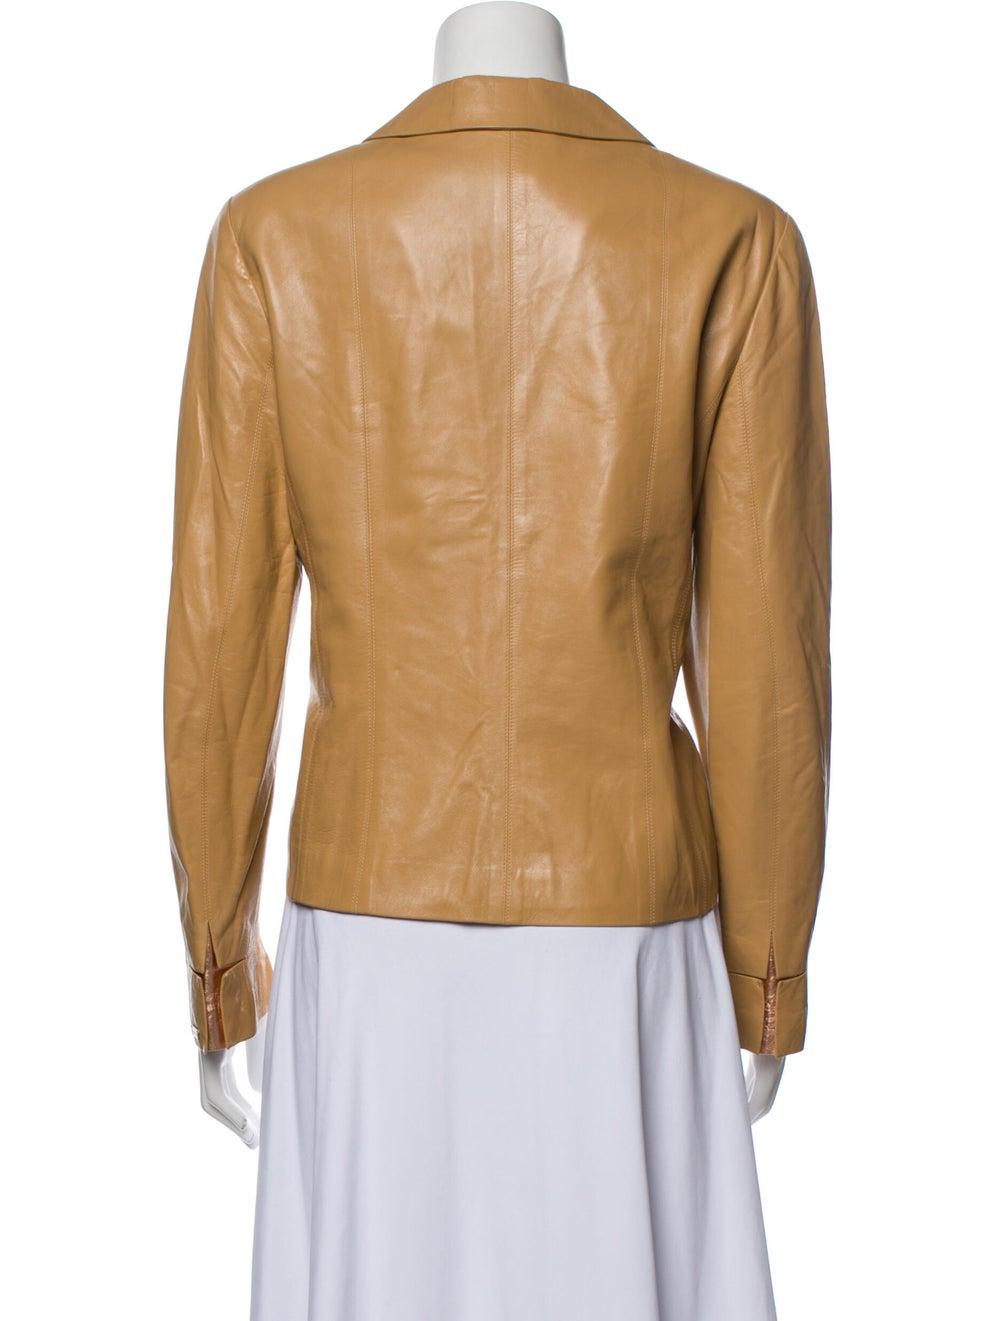 Chanel 2001 Biker Jacket - image 3